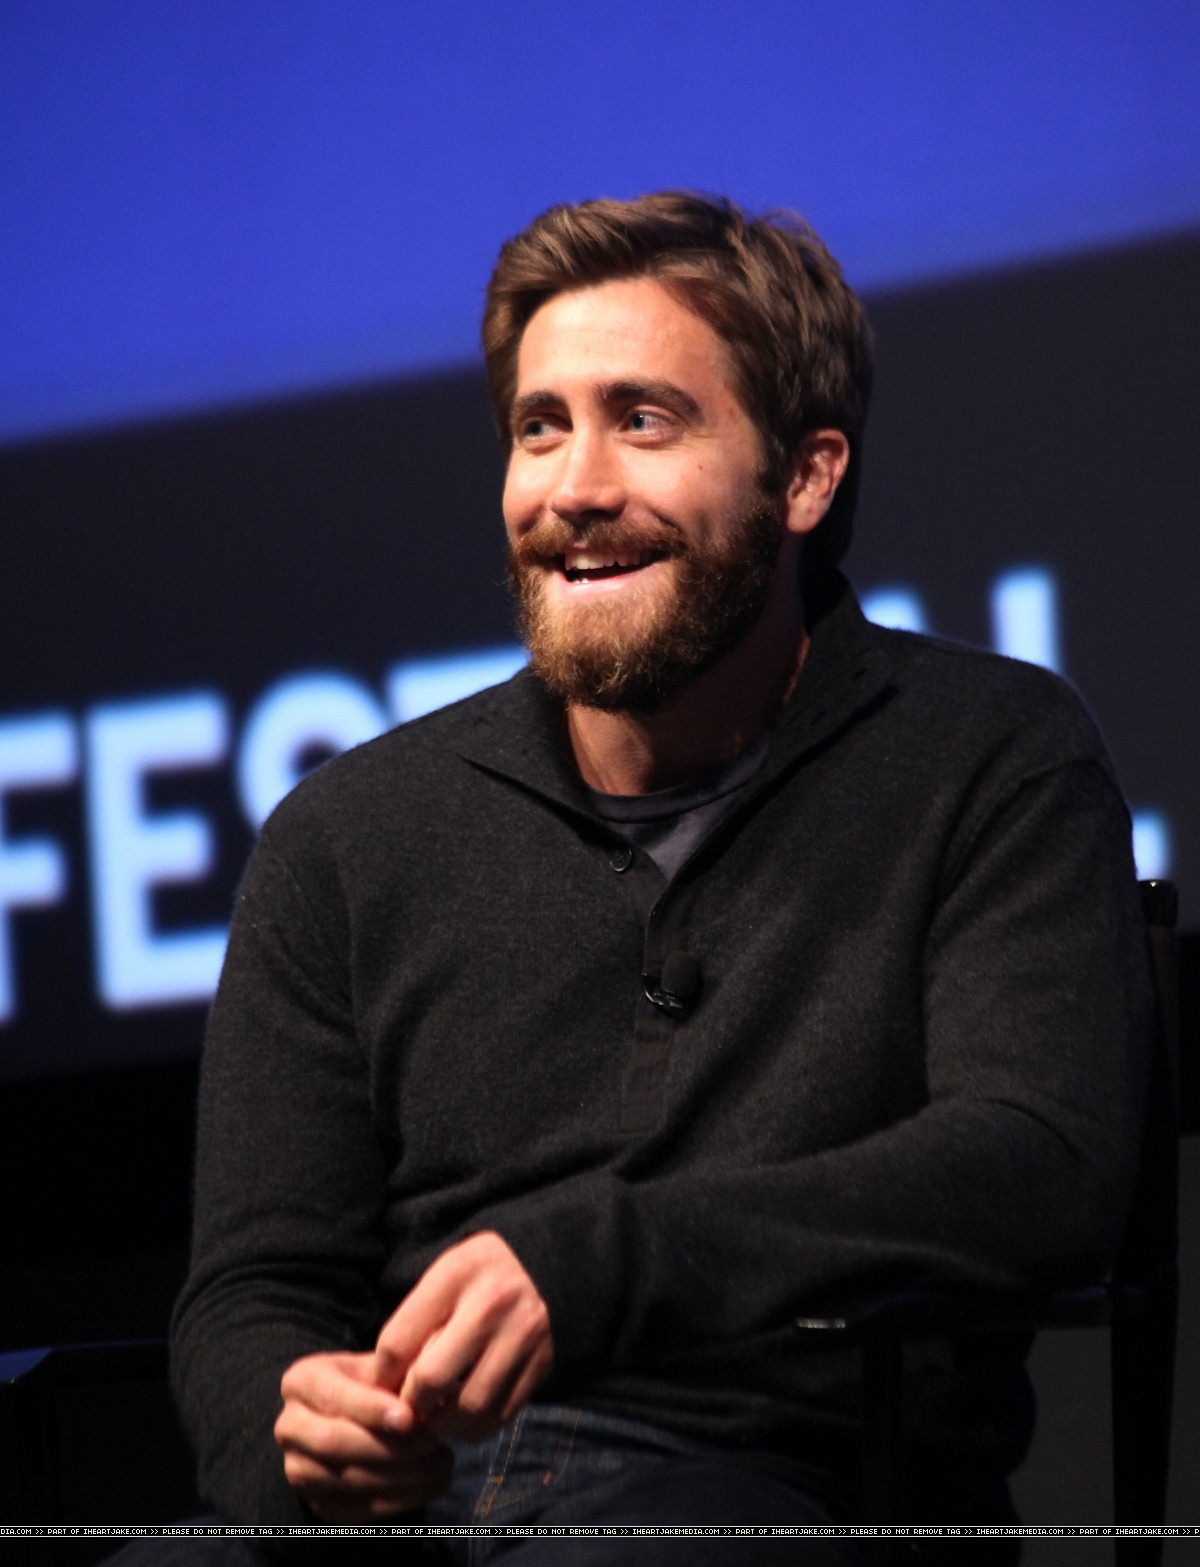 Jake gyllenhaal beard  BentalaSaloncom